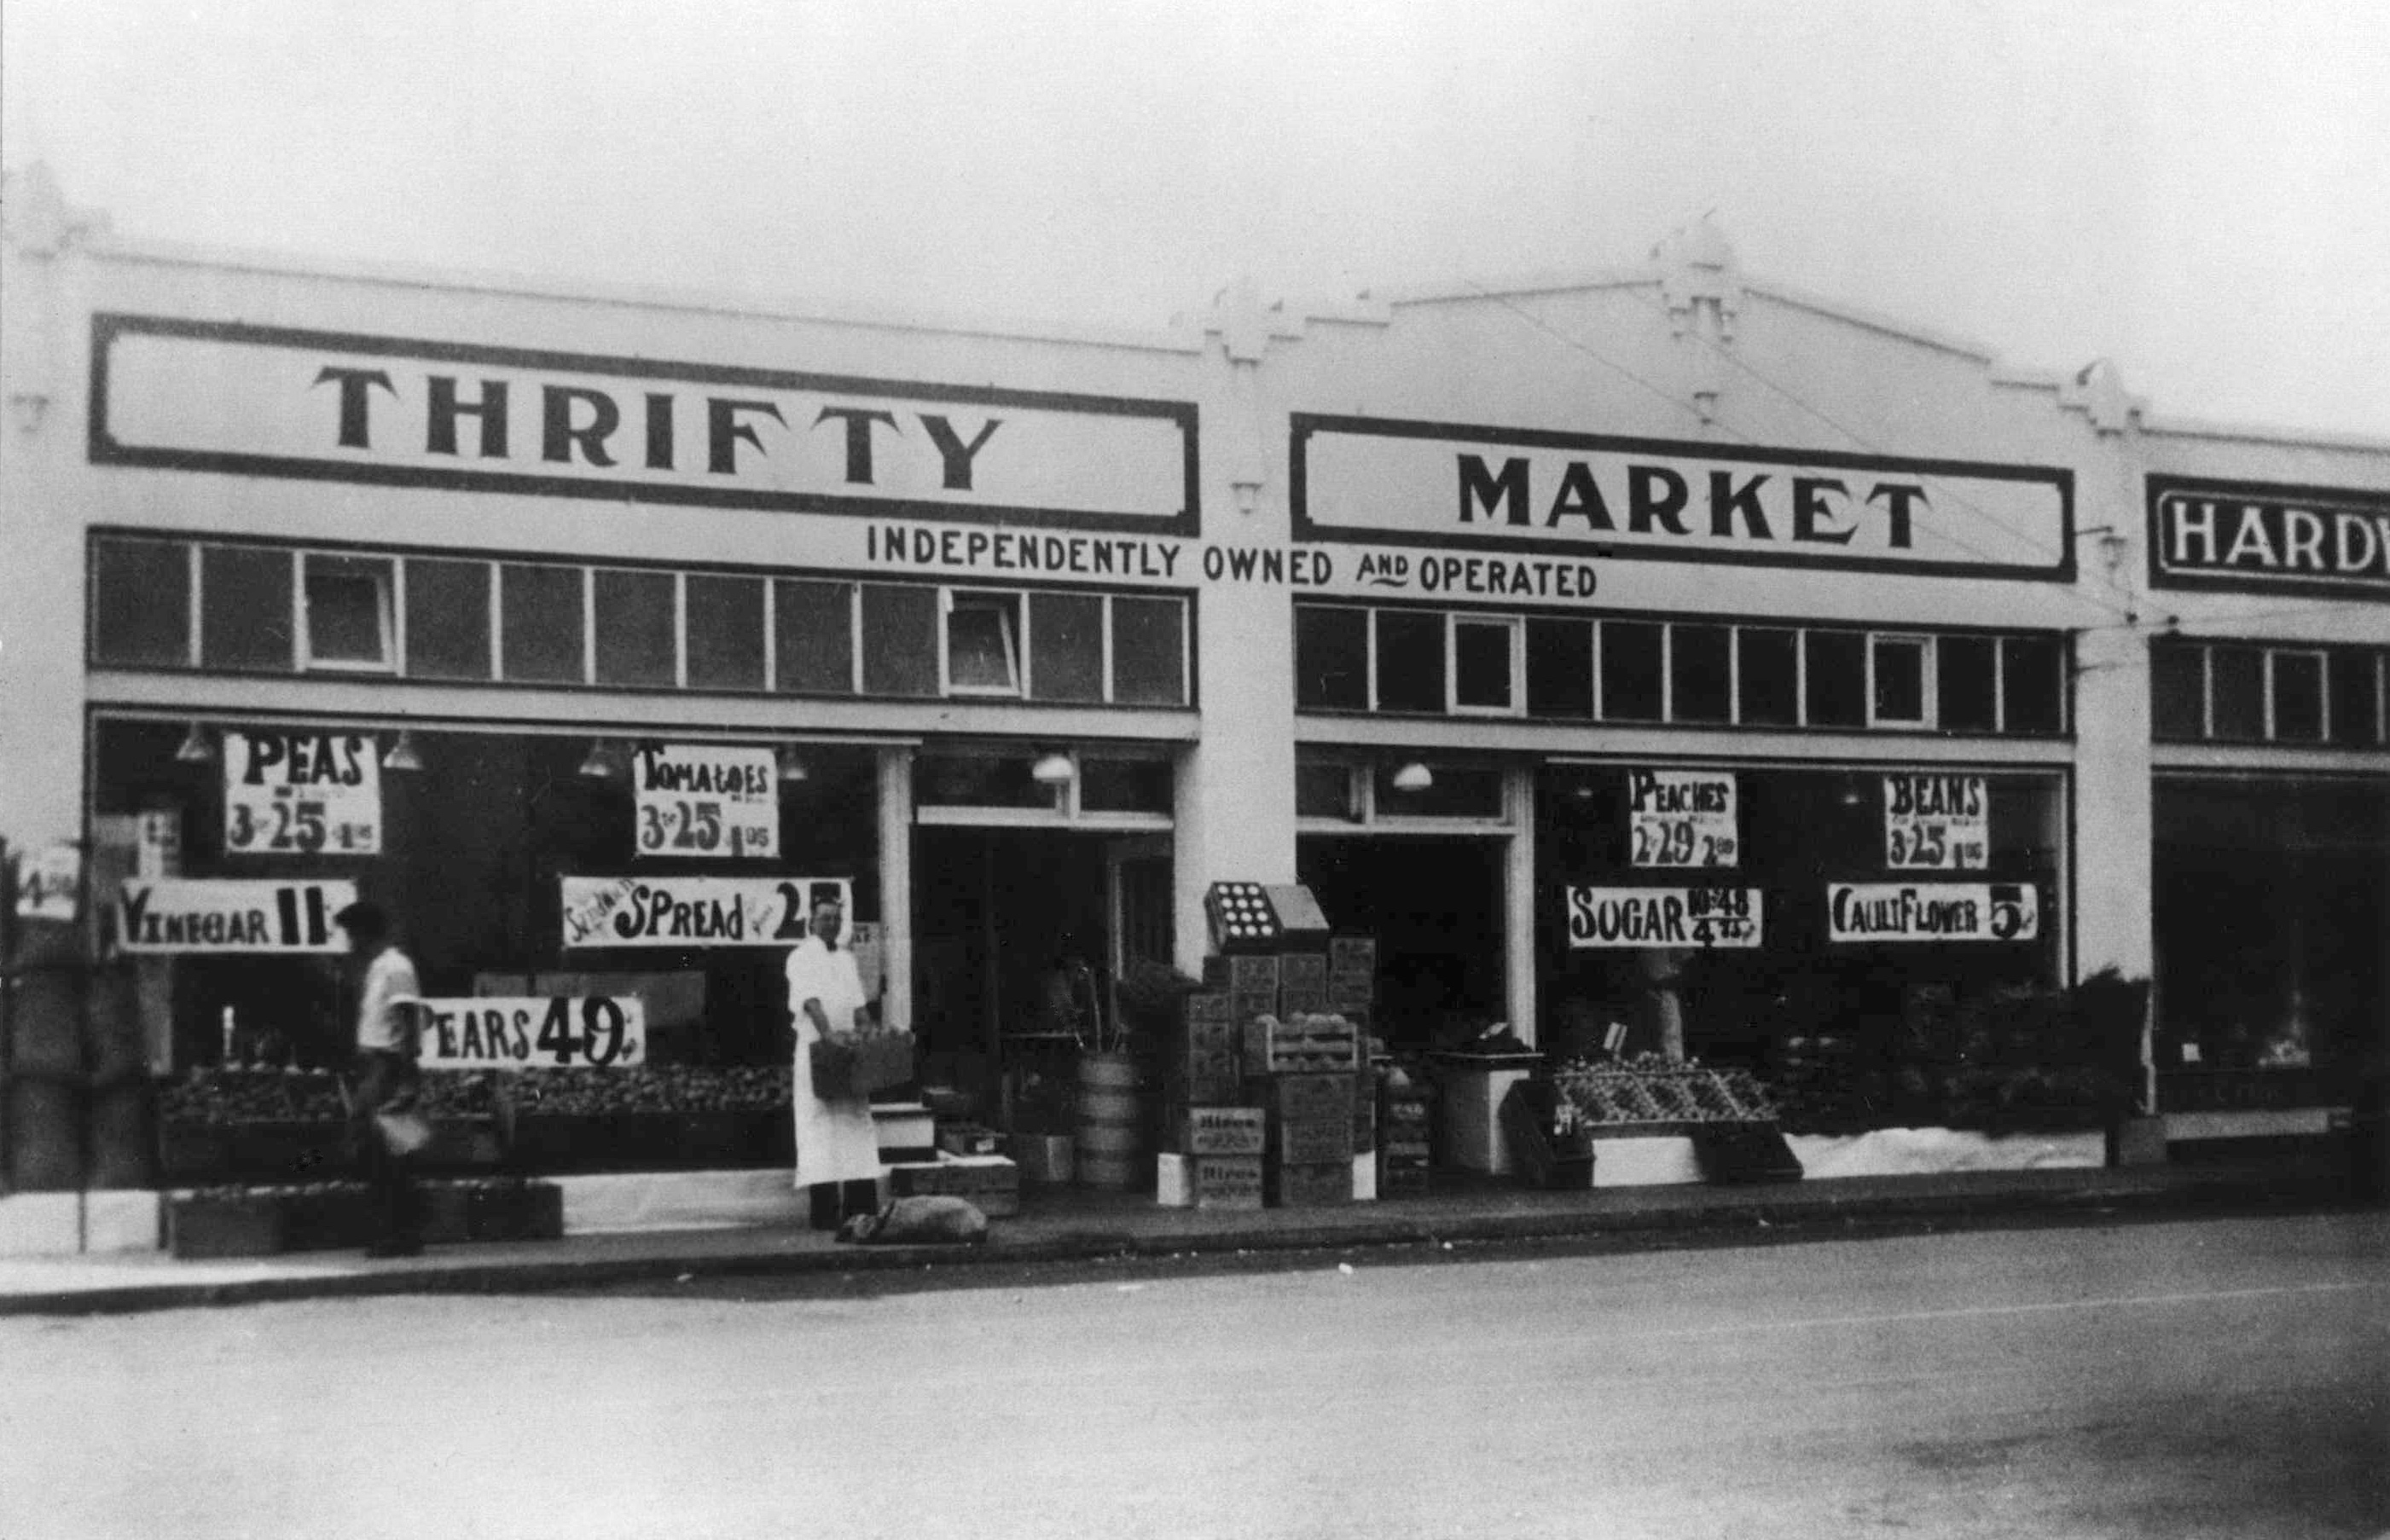 File:Thrifty Market, 1930's (Beaverton, Oregon Historical